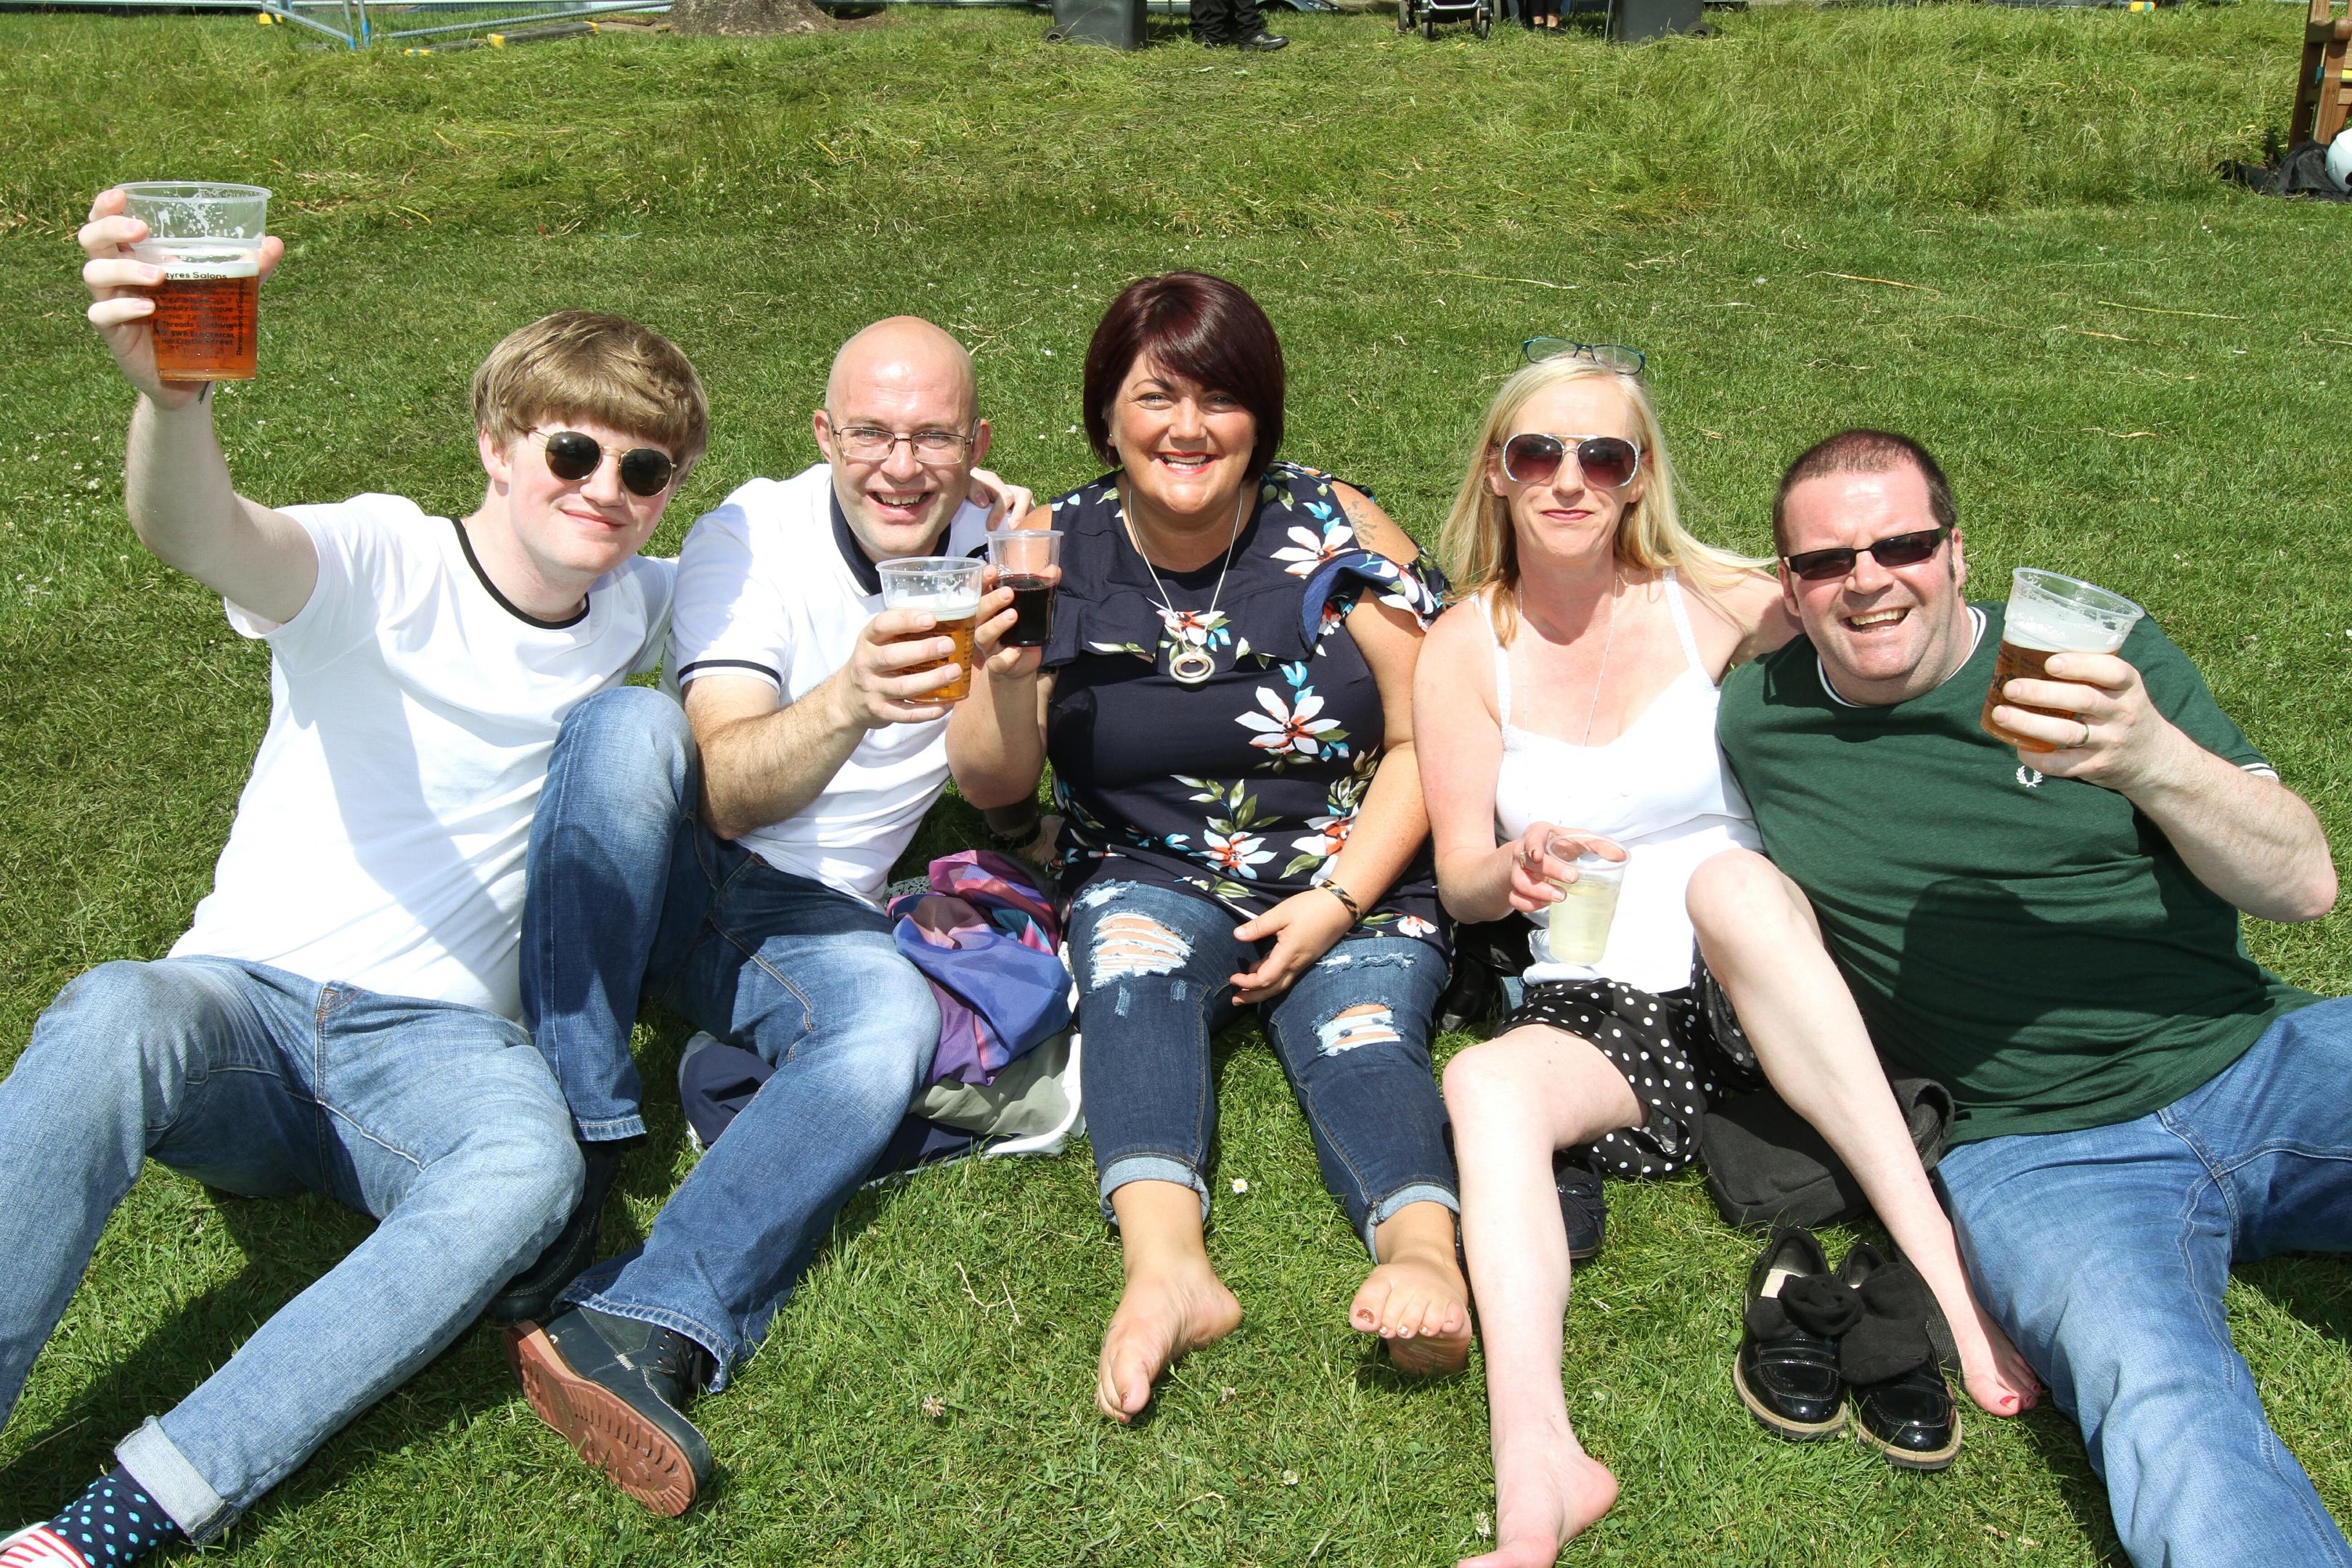 Ryan Horne, Stephen Davidson, Vicky Davidson, Maggie Horne and Sean Horne from West Port enjoying WestFest.